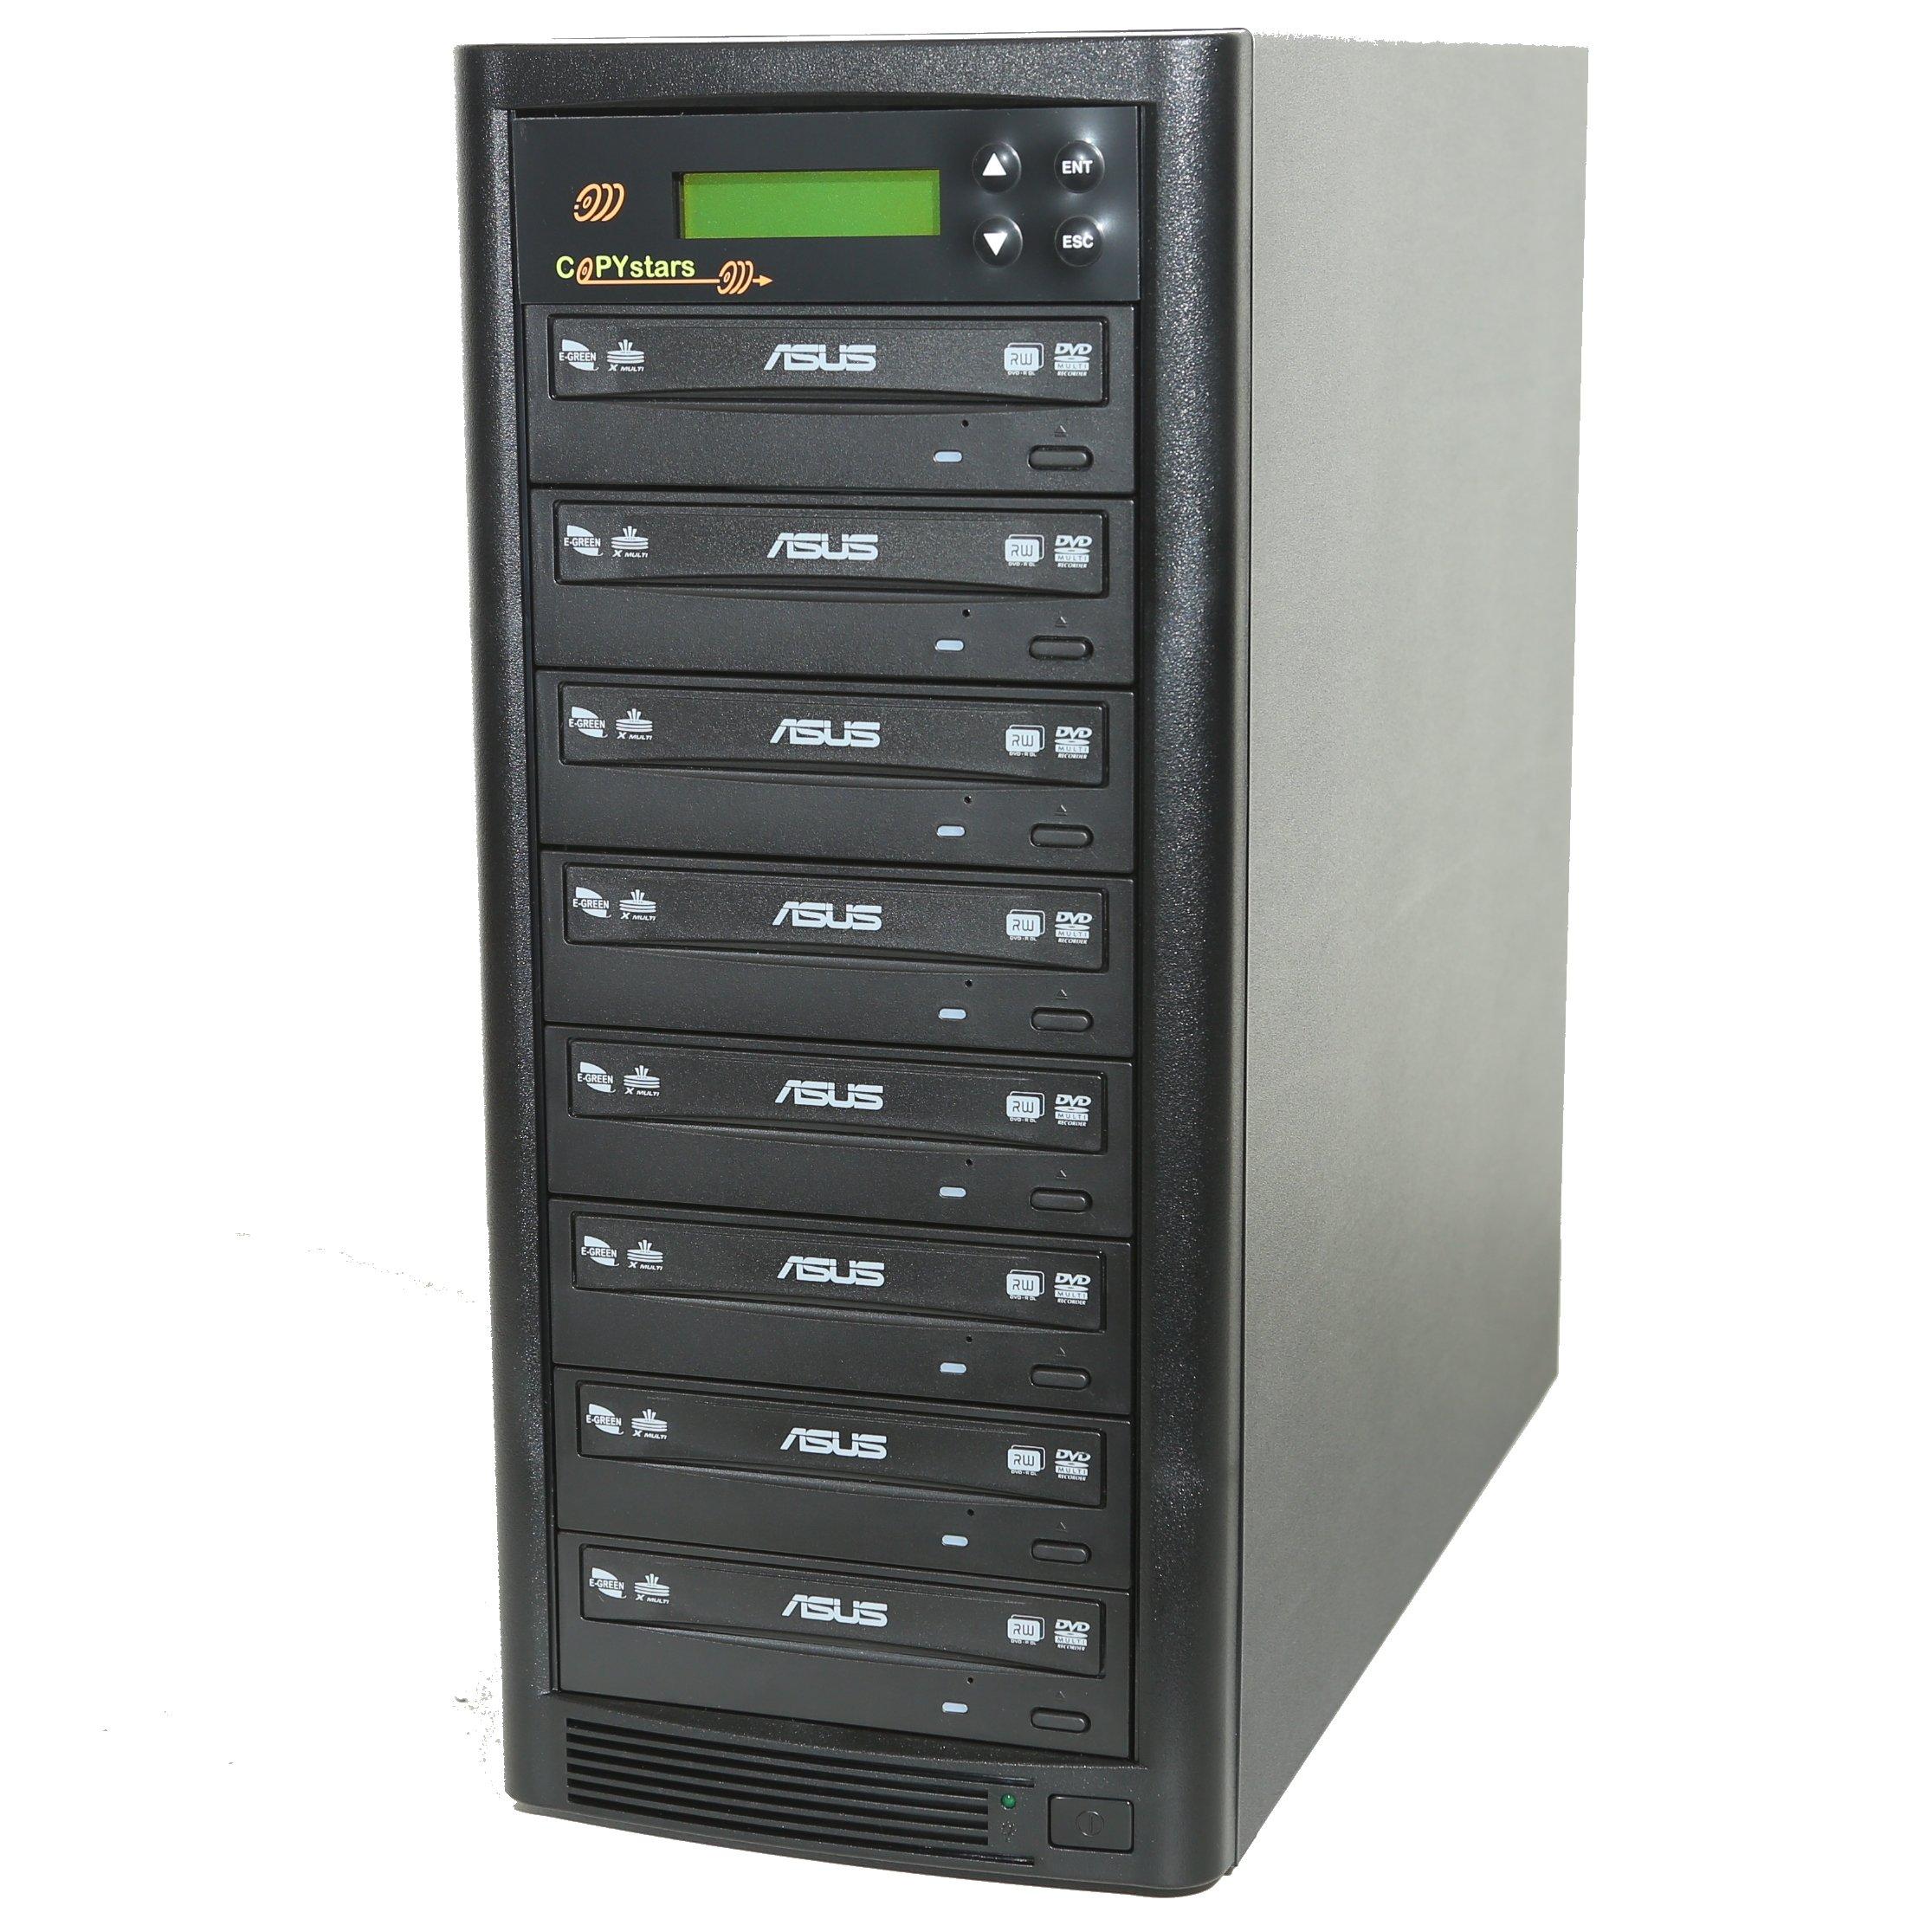 Copystar DVD Duplicator Sata 1 to 7 24X DVD-Burner Drive CD DVD Duplicator Writer Copier Tower by Copystar